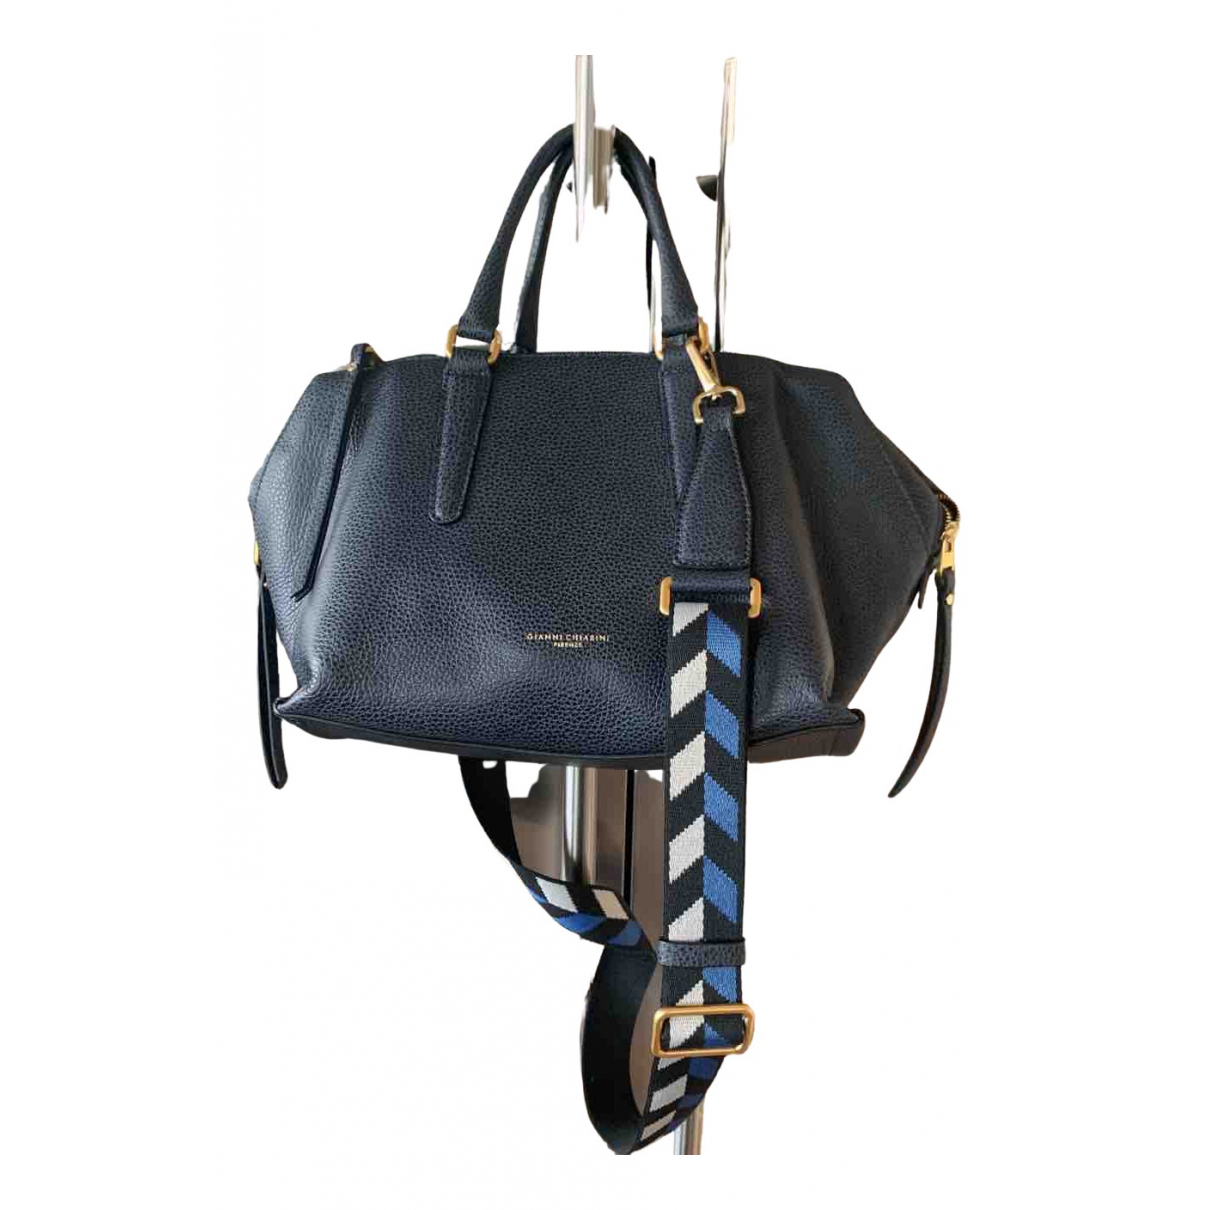 Gianni Chiarini \N Handtasche in  Blau Leder